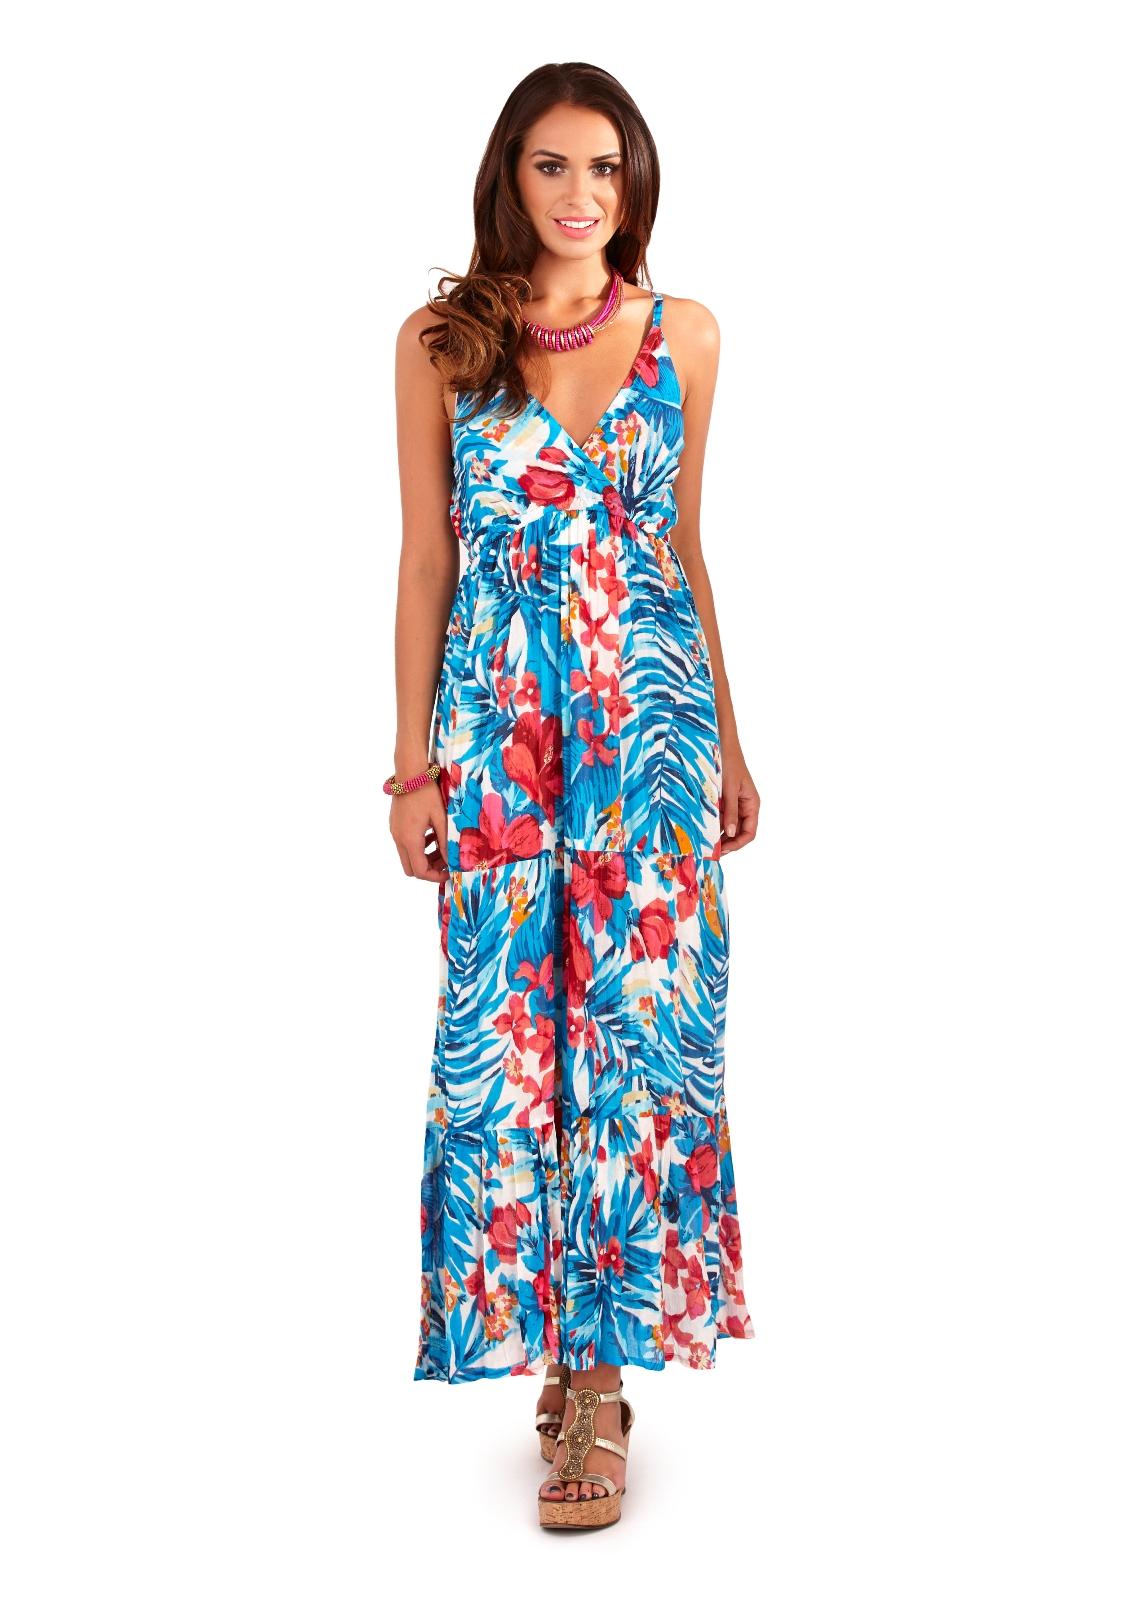 Womens maxi dress neck full length summer dress ladies size jpg 1143x1600  Womens maxi dresses e7c197bee